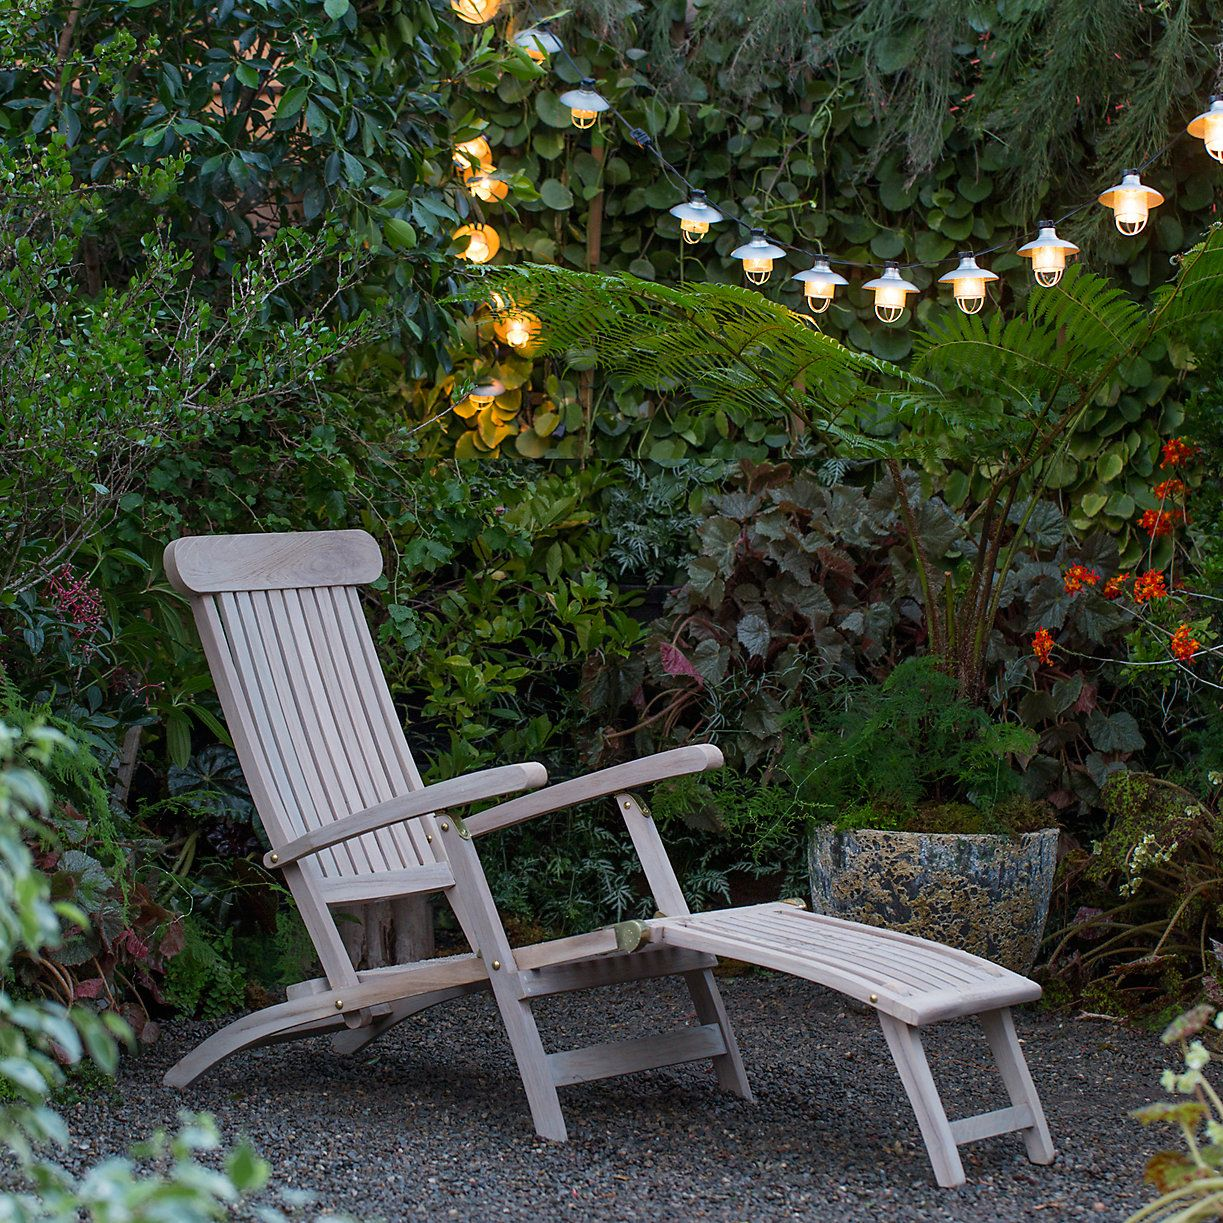 Garden decor trellis  Stargazer Garden Trellis Lights  Lights Outdoor living and Patios